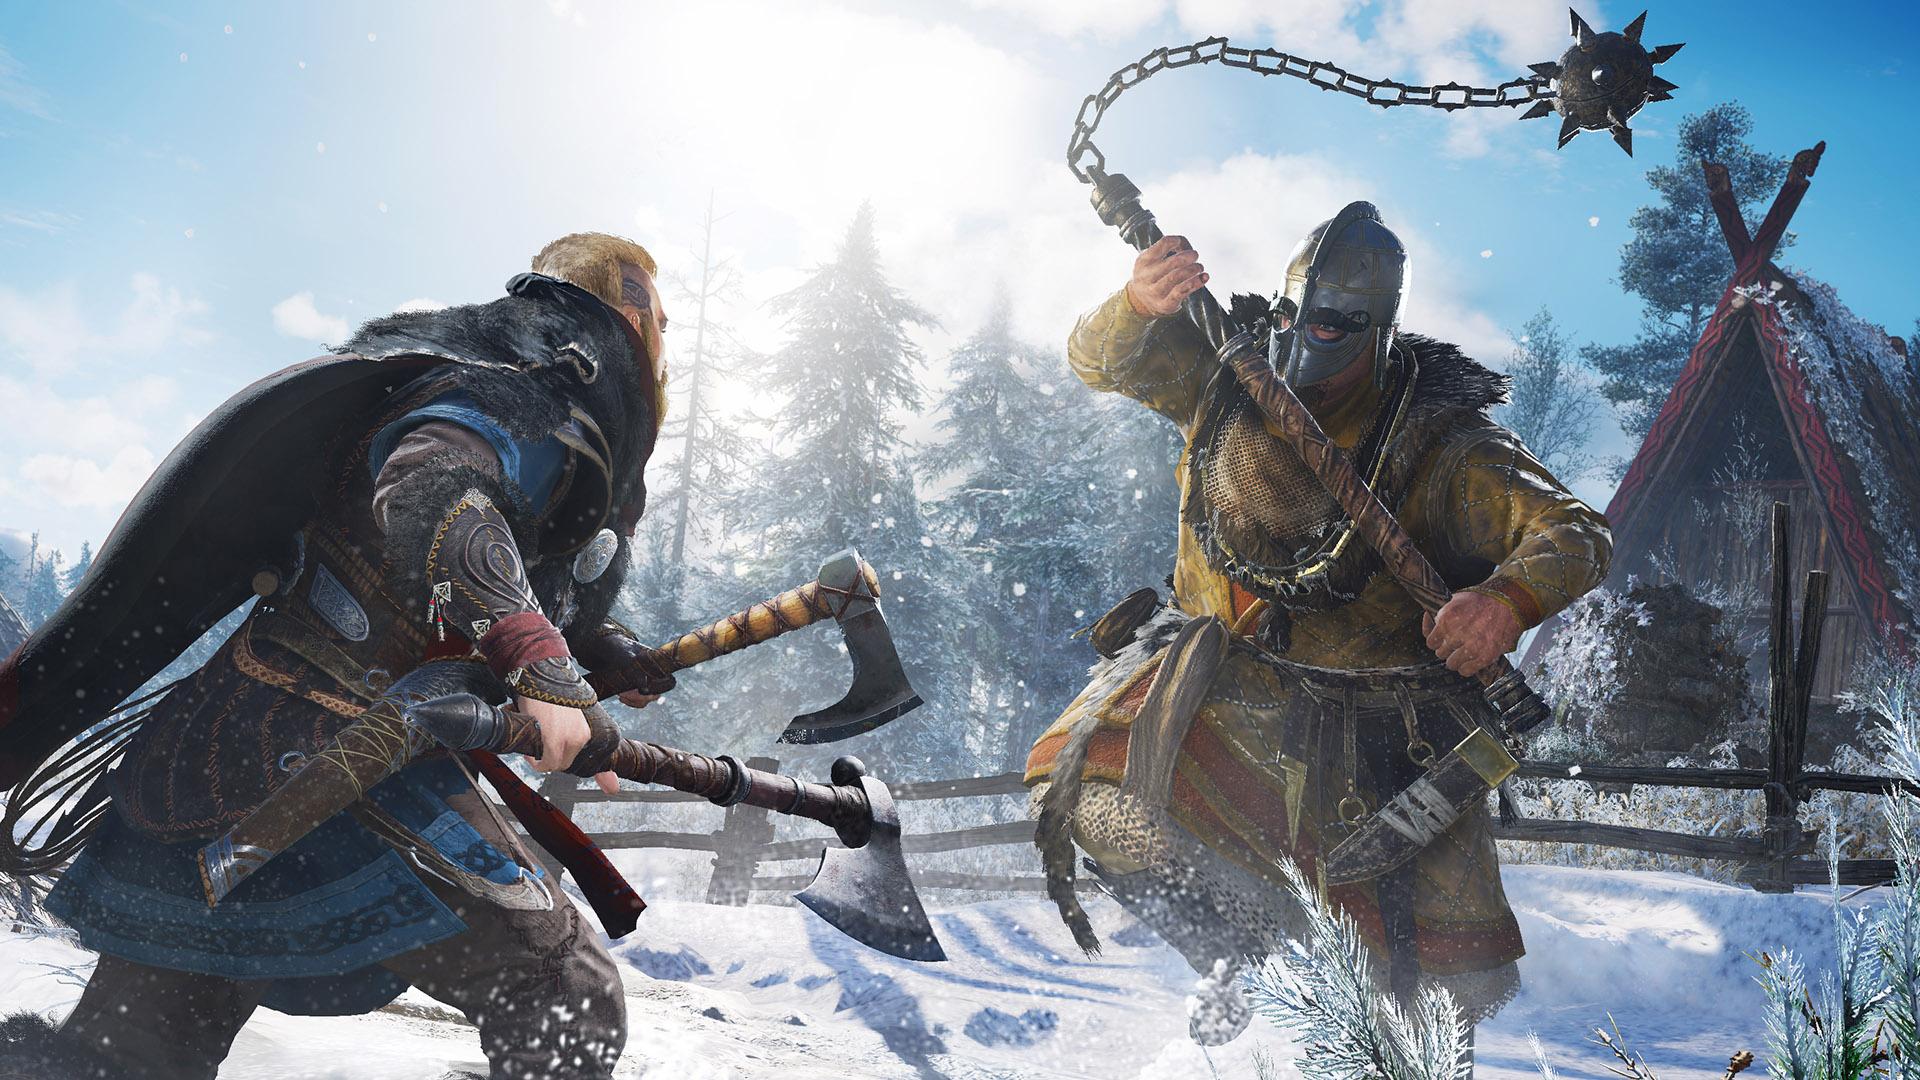 Assassin's Creed Valhalla update adds reward to Death Stranding mission